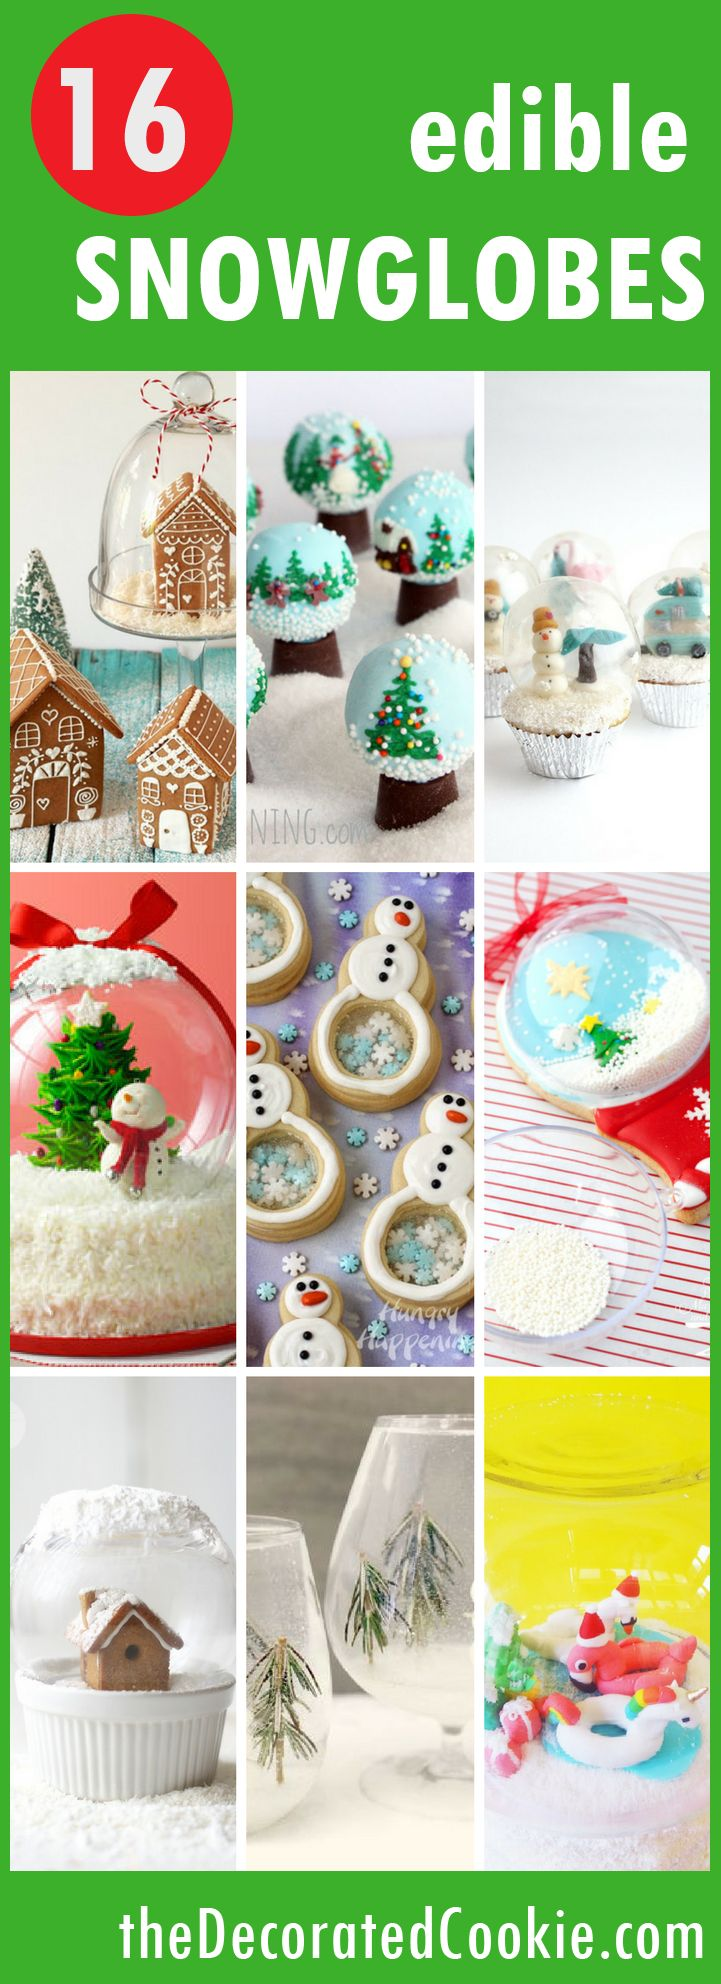 16 edible snowglobes for Christmas